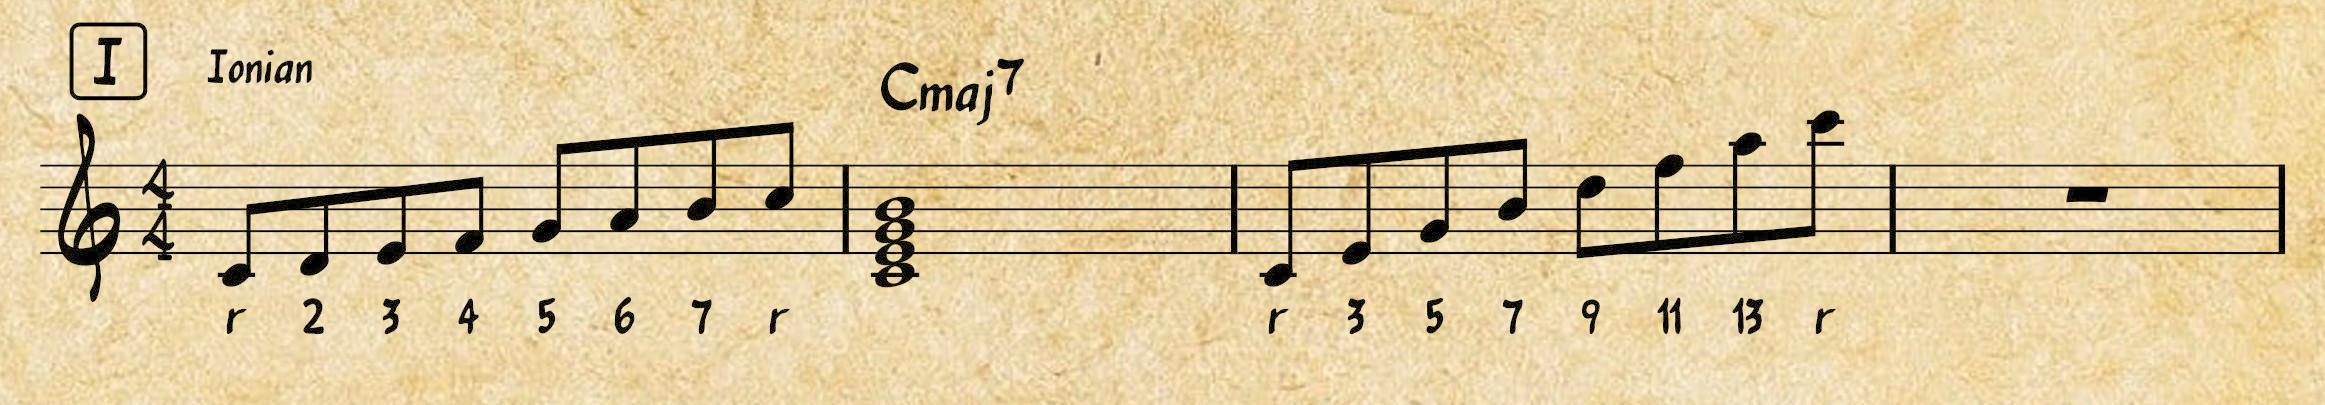 Western Music Theory: Ionian